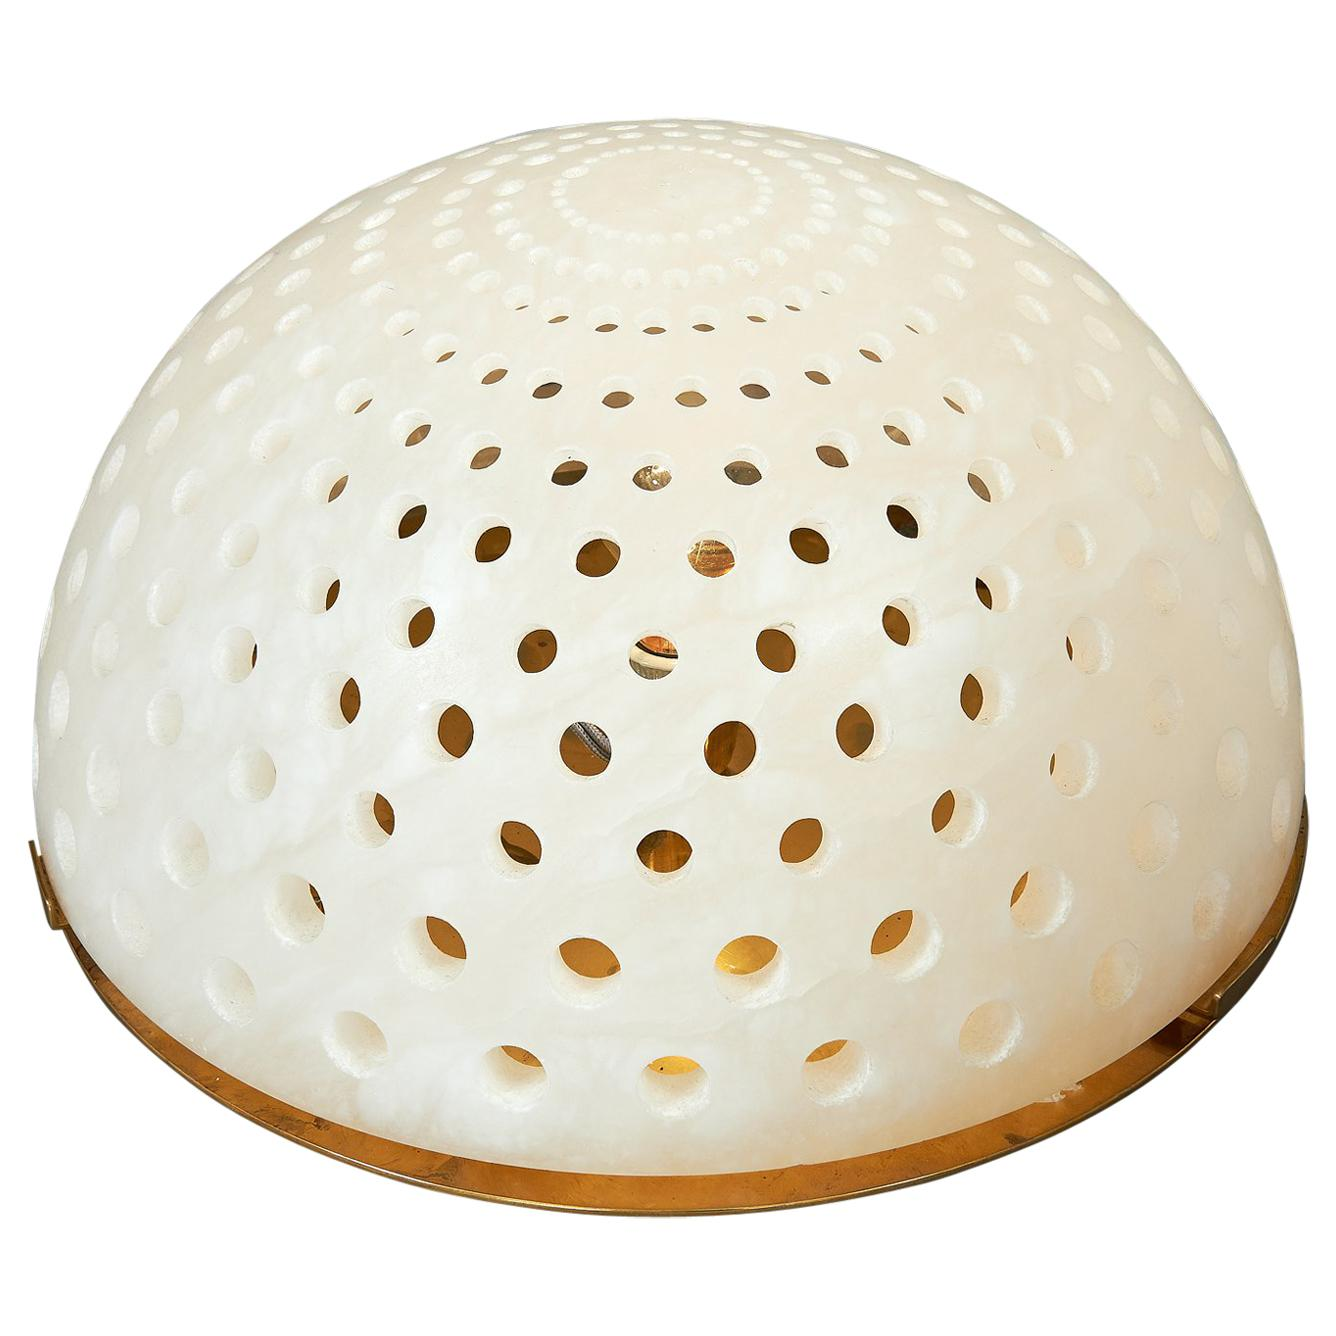 Angelo Mangiarotti Alabaster Table Lamp, circa 1980